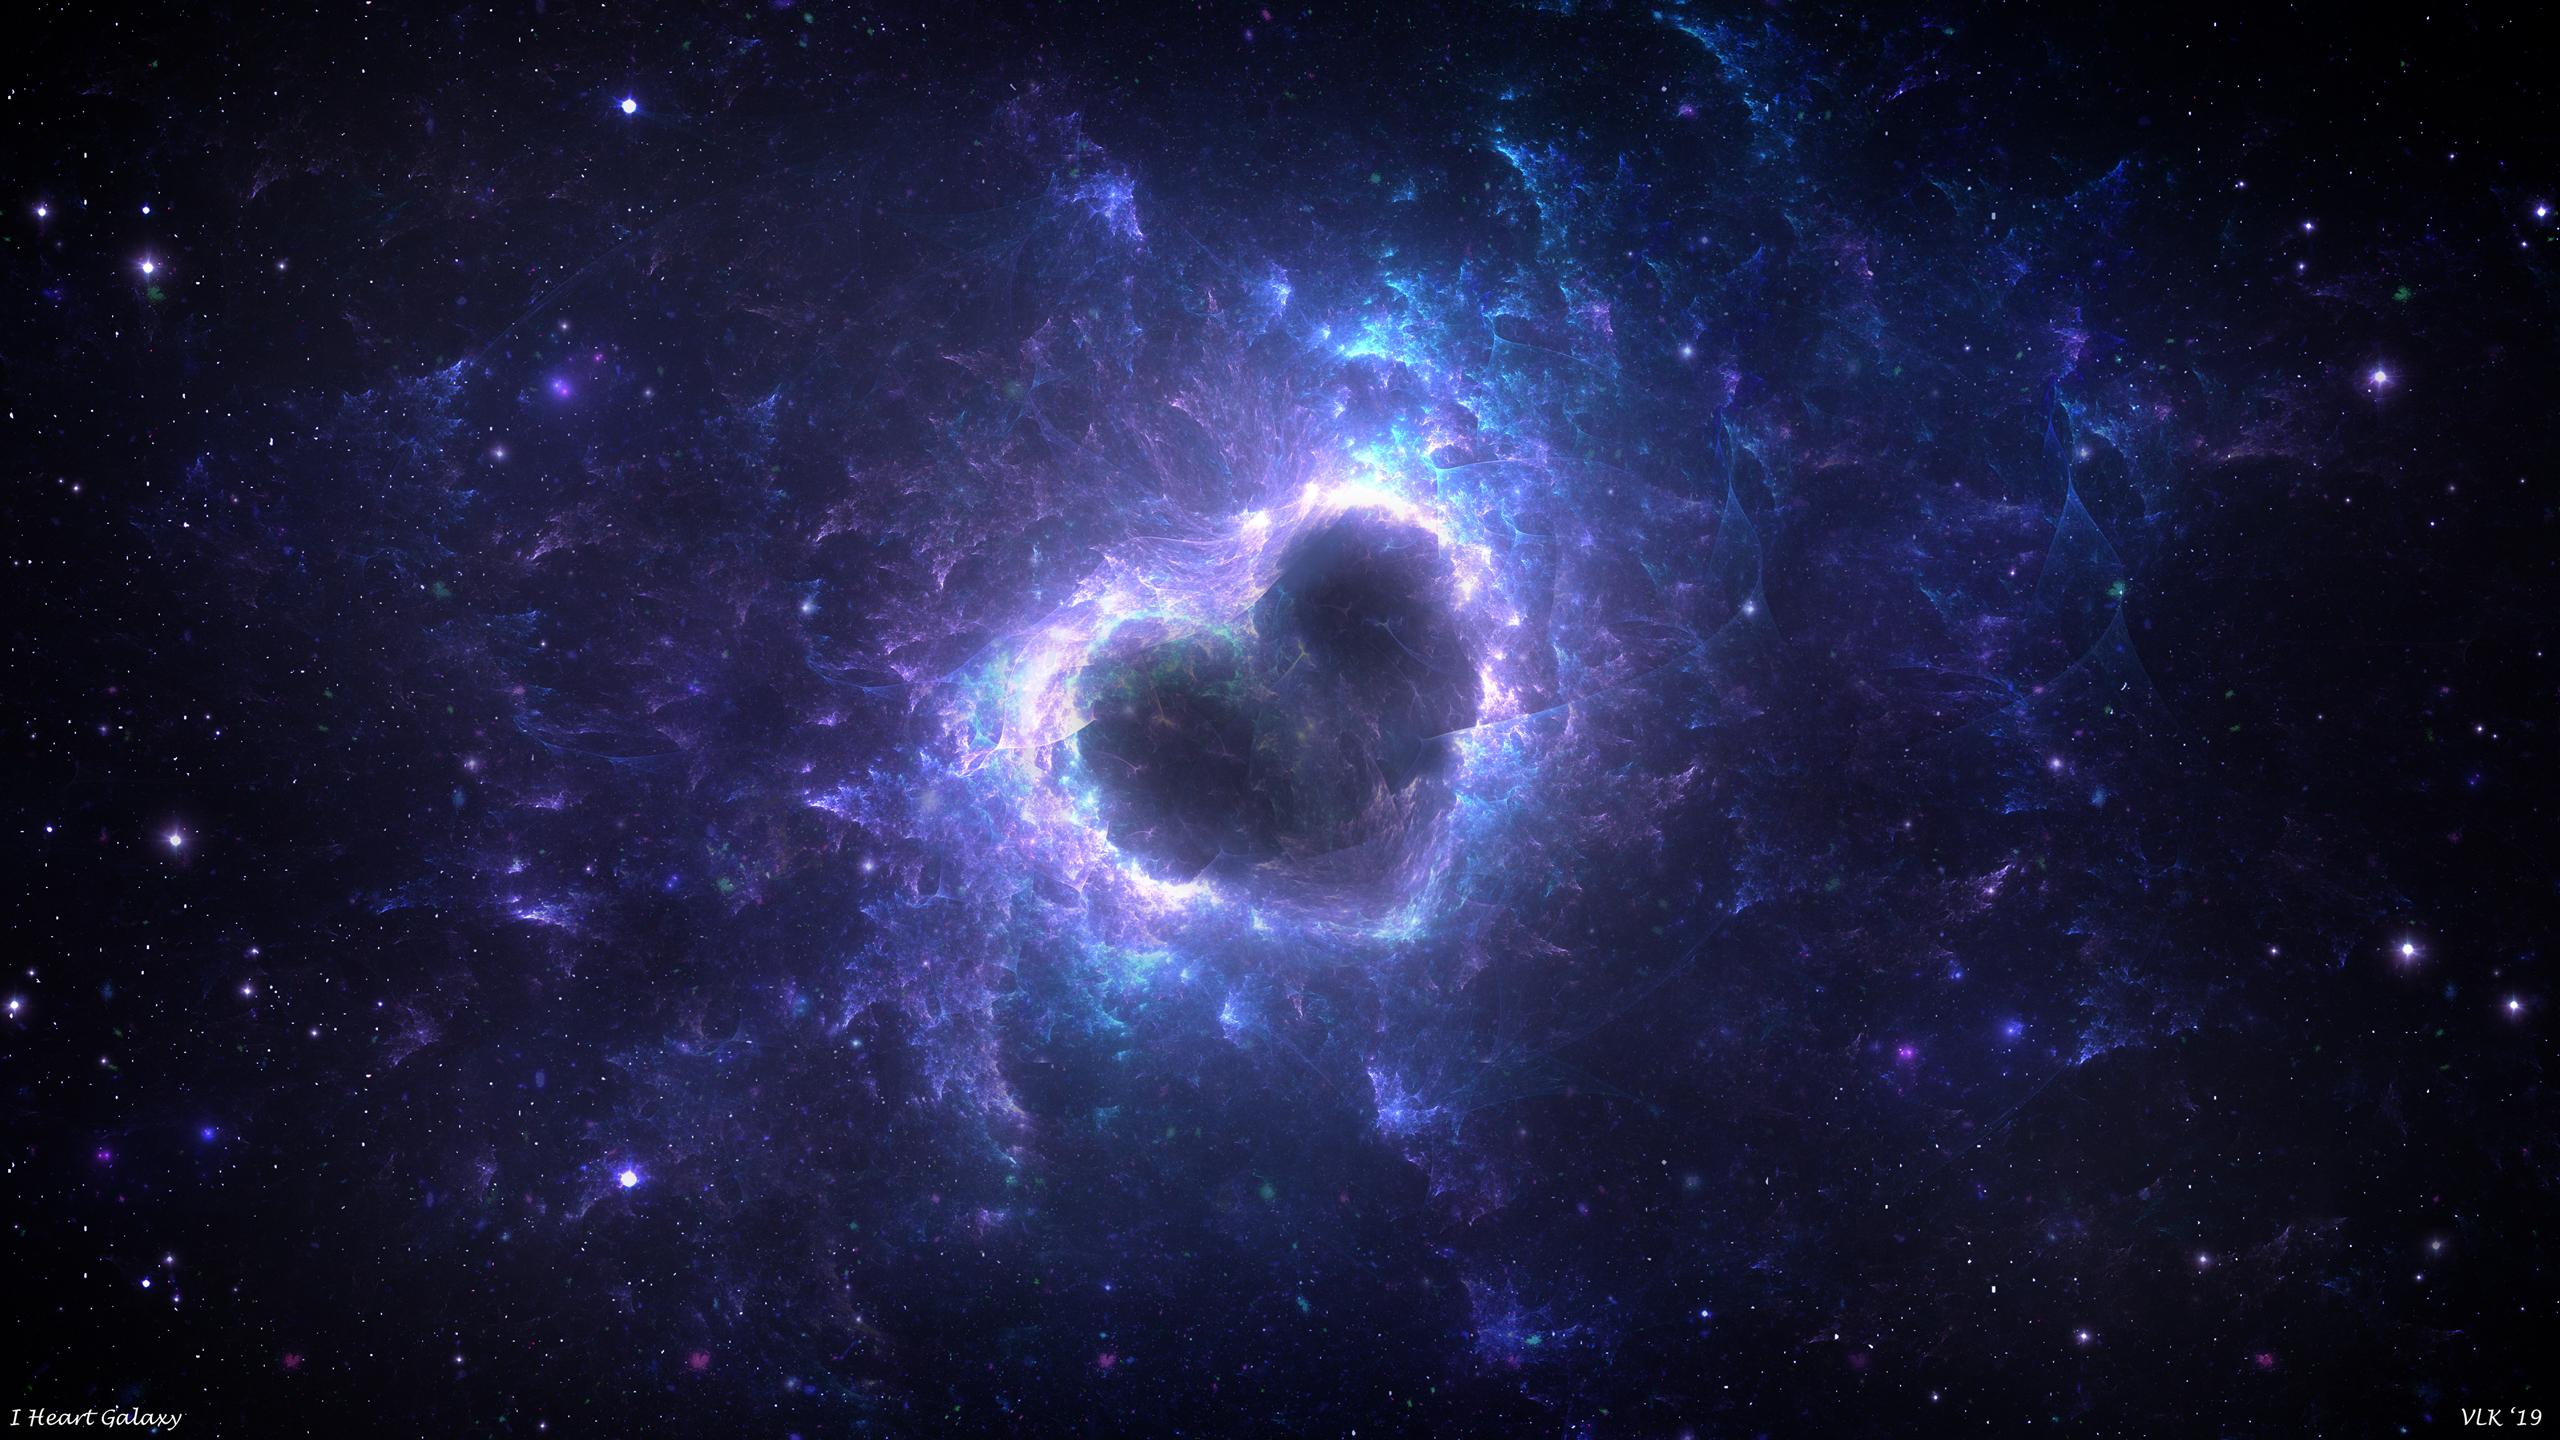 Wallpaper Love Heart Space Stars Galaxy Fractal